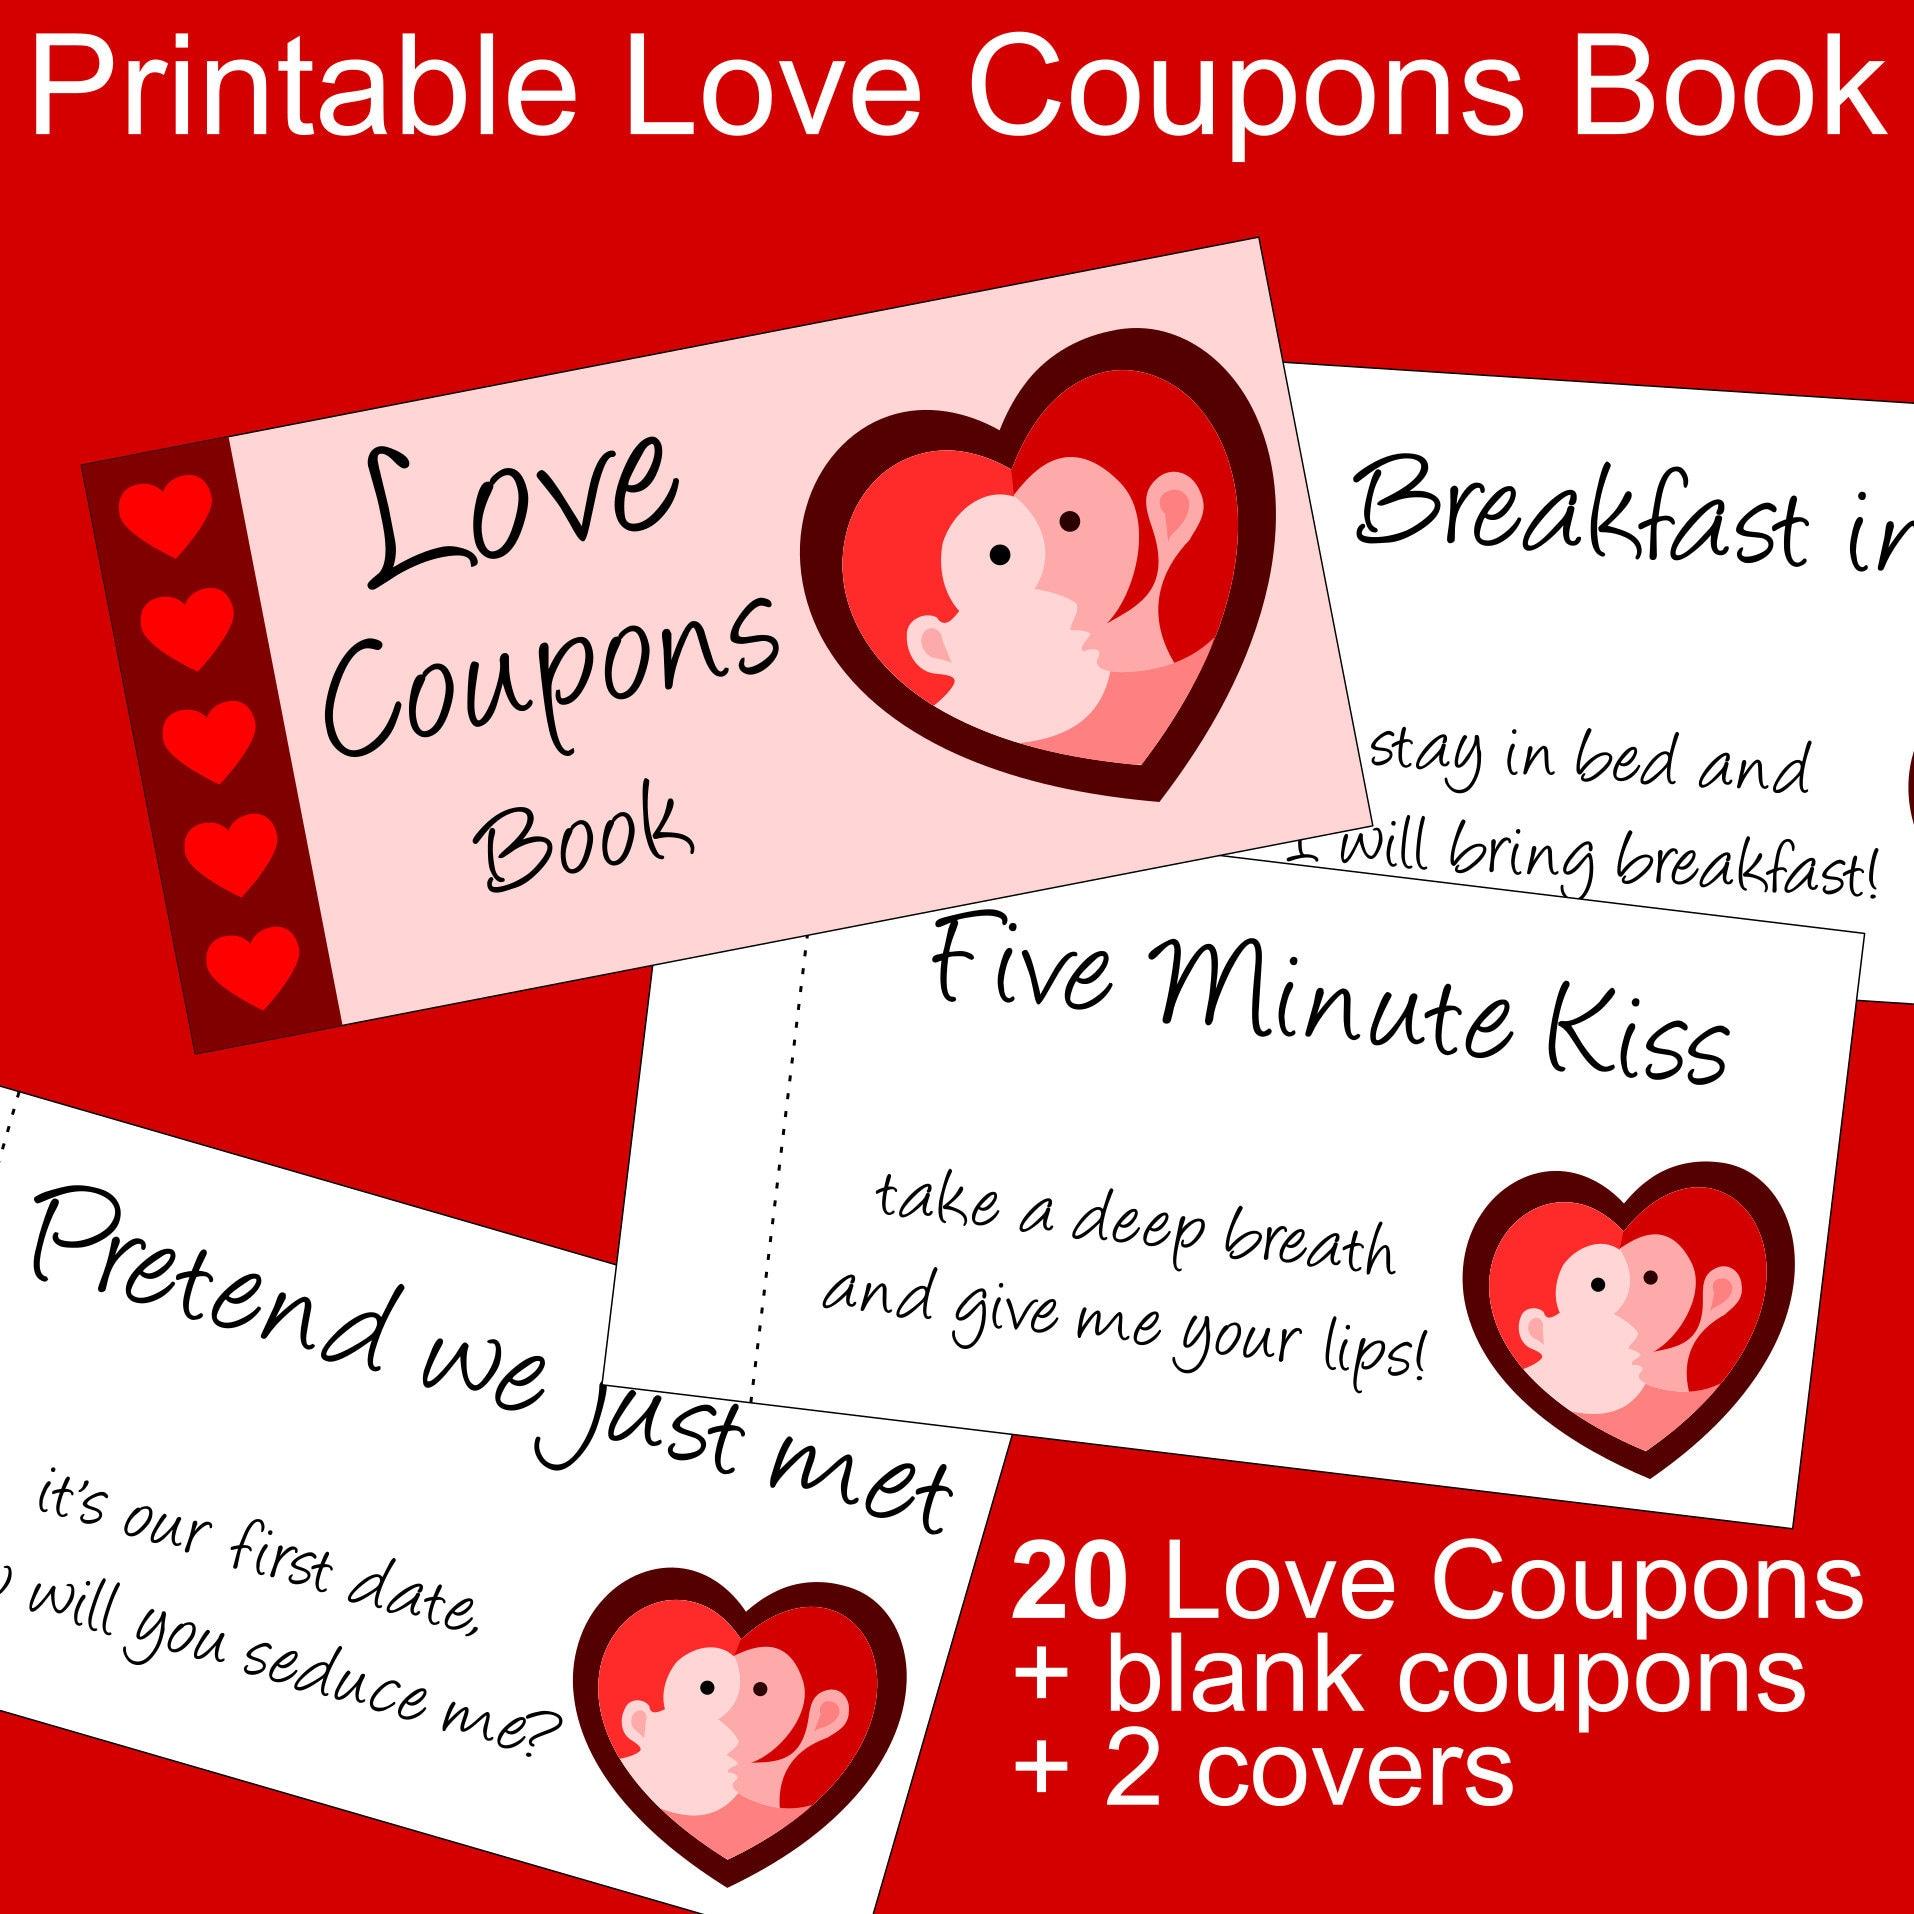 coupon ideas for your boyfriend